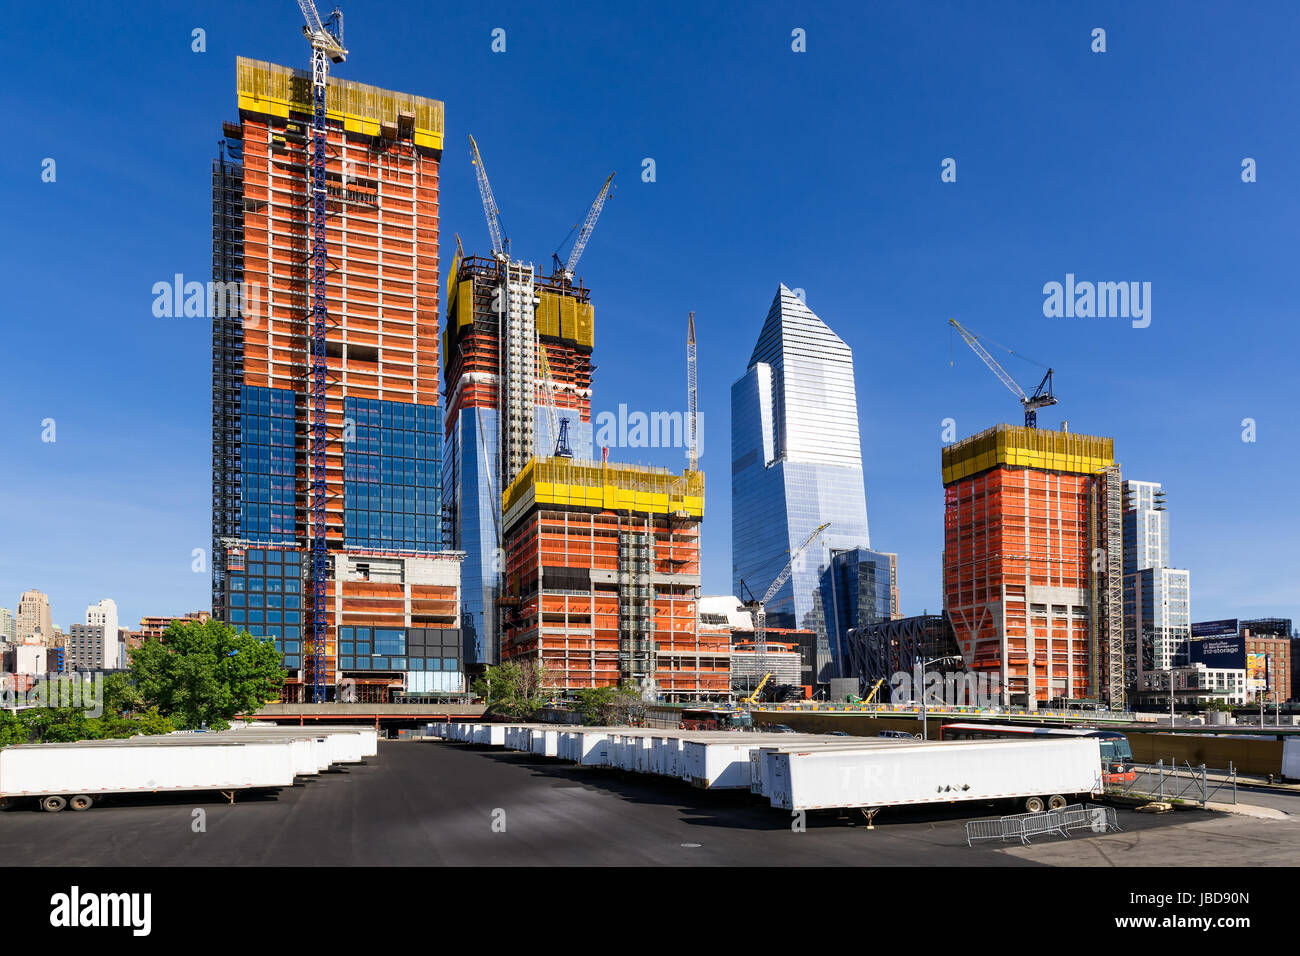 The Hudson Yards construction site (2017). Midtown, Manhattan, New York City - Stock Image